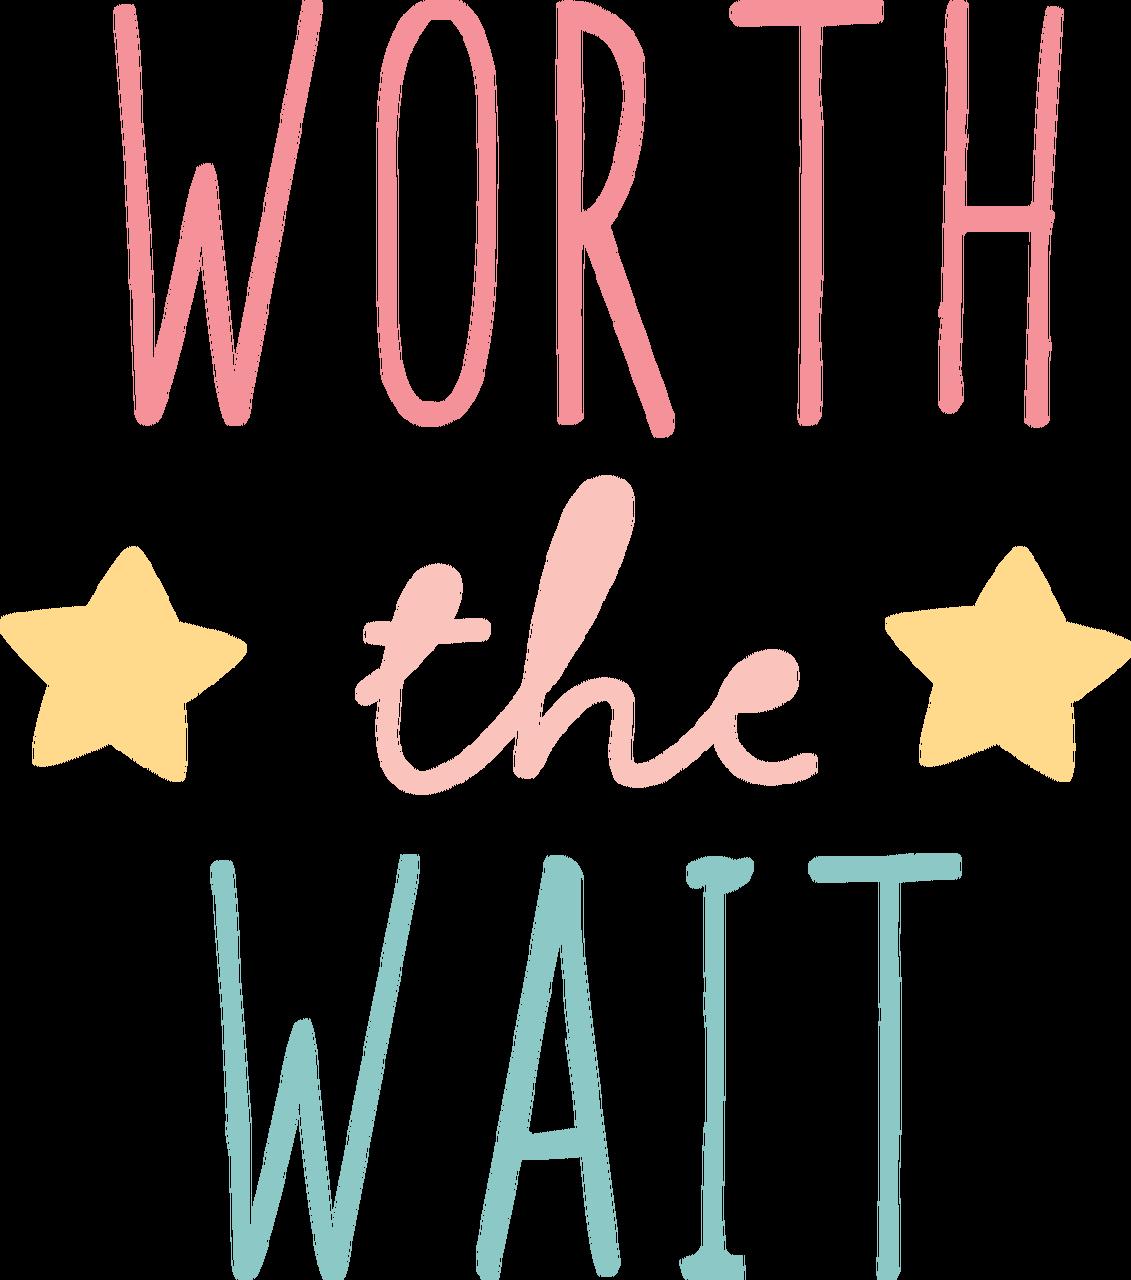 Worth The Wait SVG Cut File